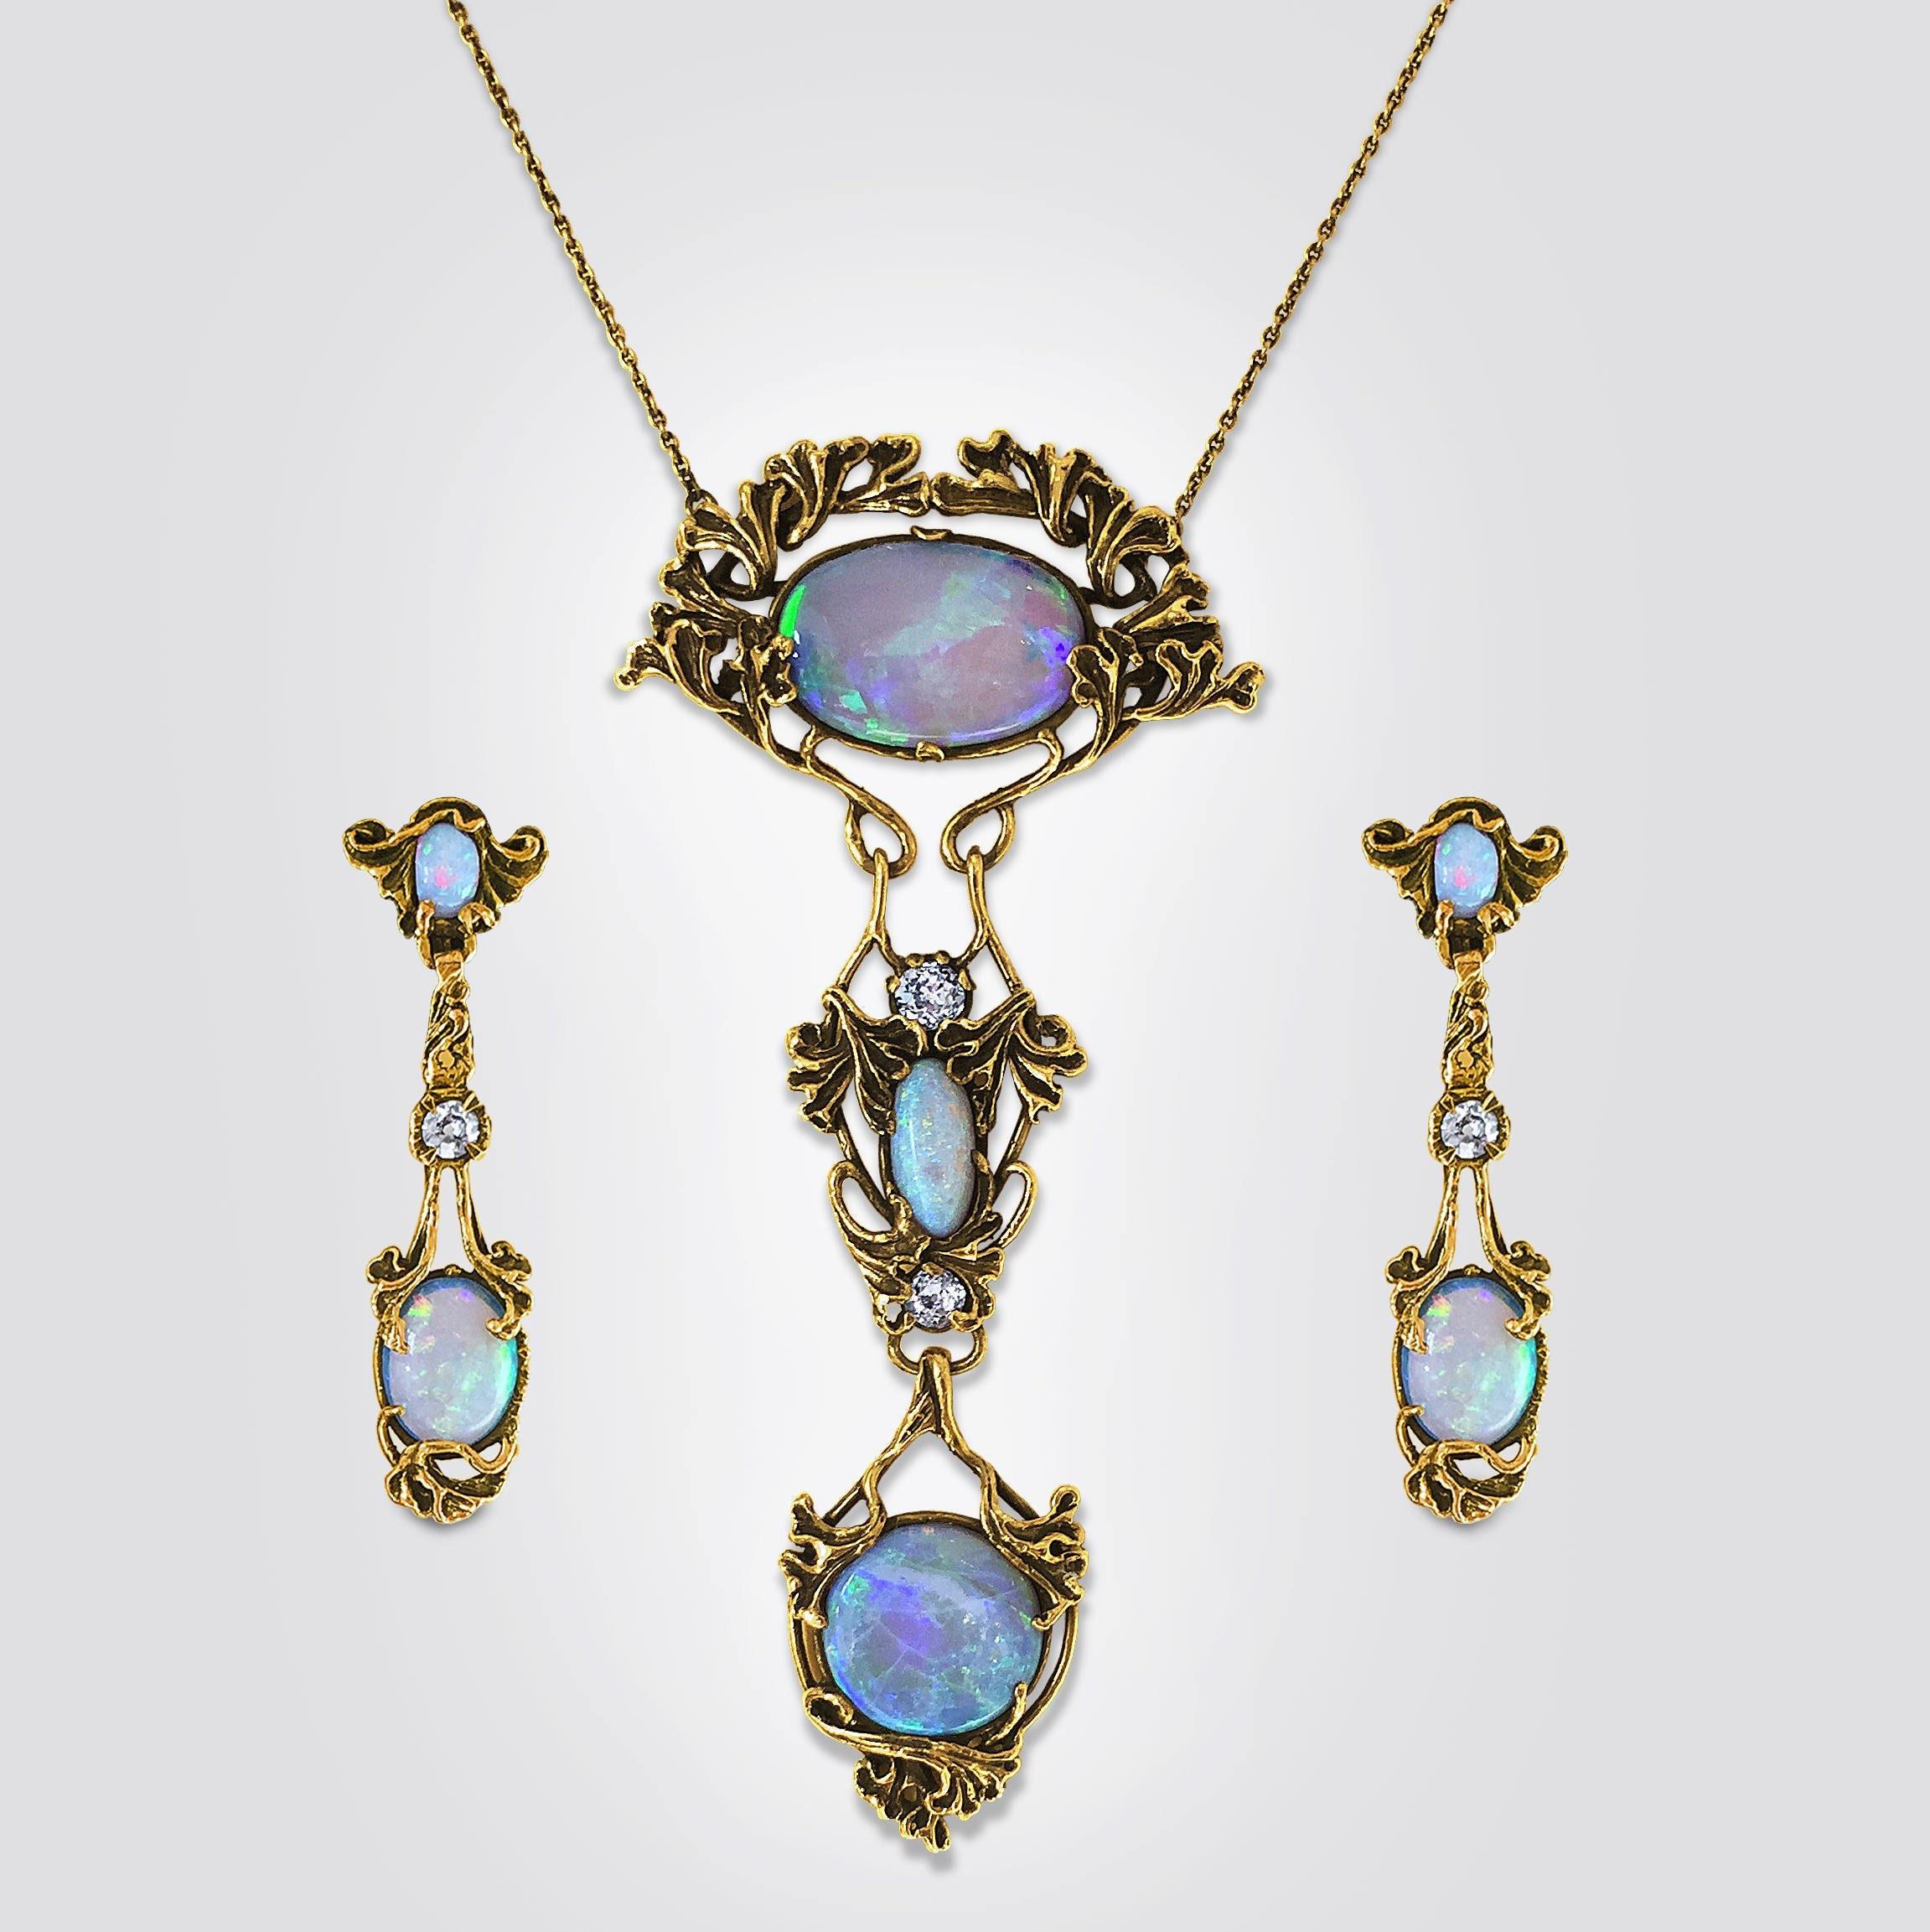 Antique-Art-Nouveau-Black-Opal-European-cut-Diamond-Necklace-pendant-Earrings-Walton&Co.-Los Angeles-circa1900